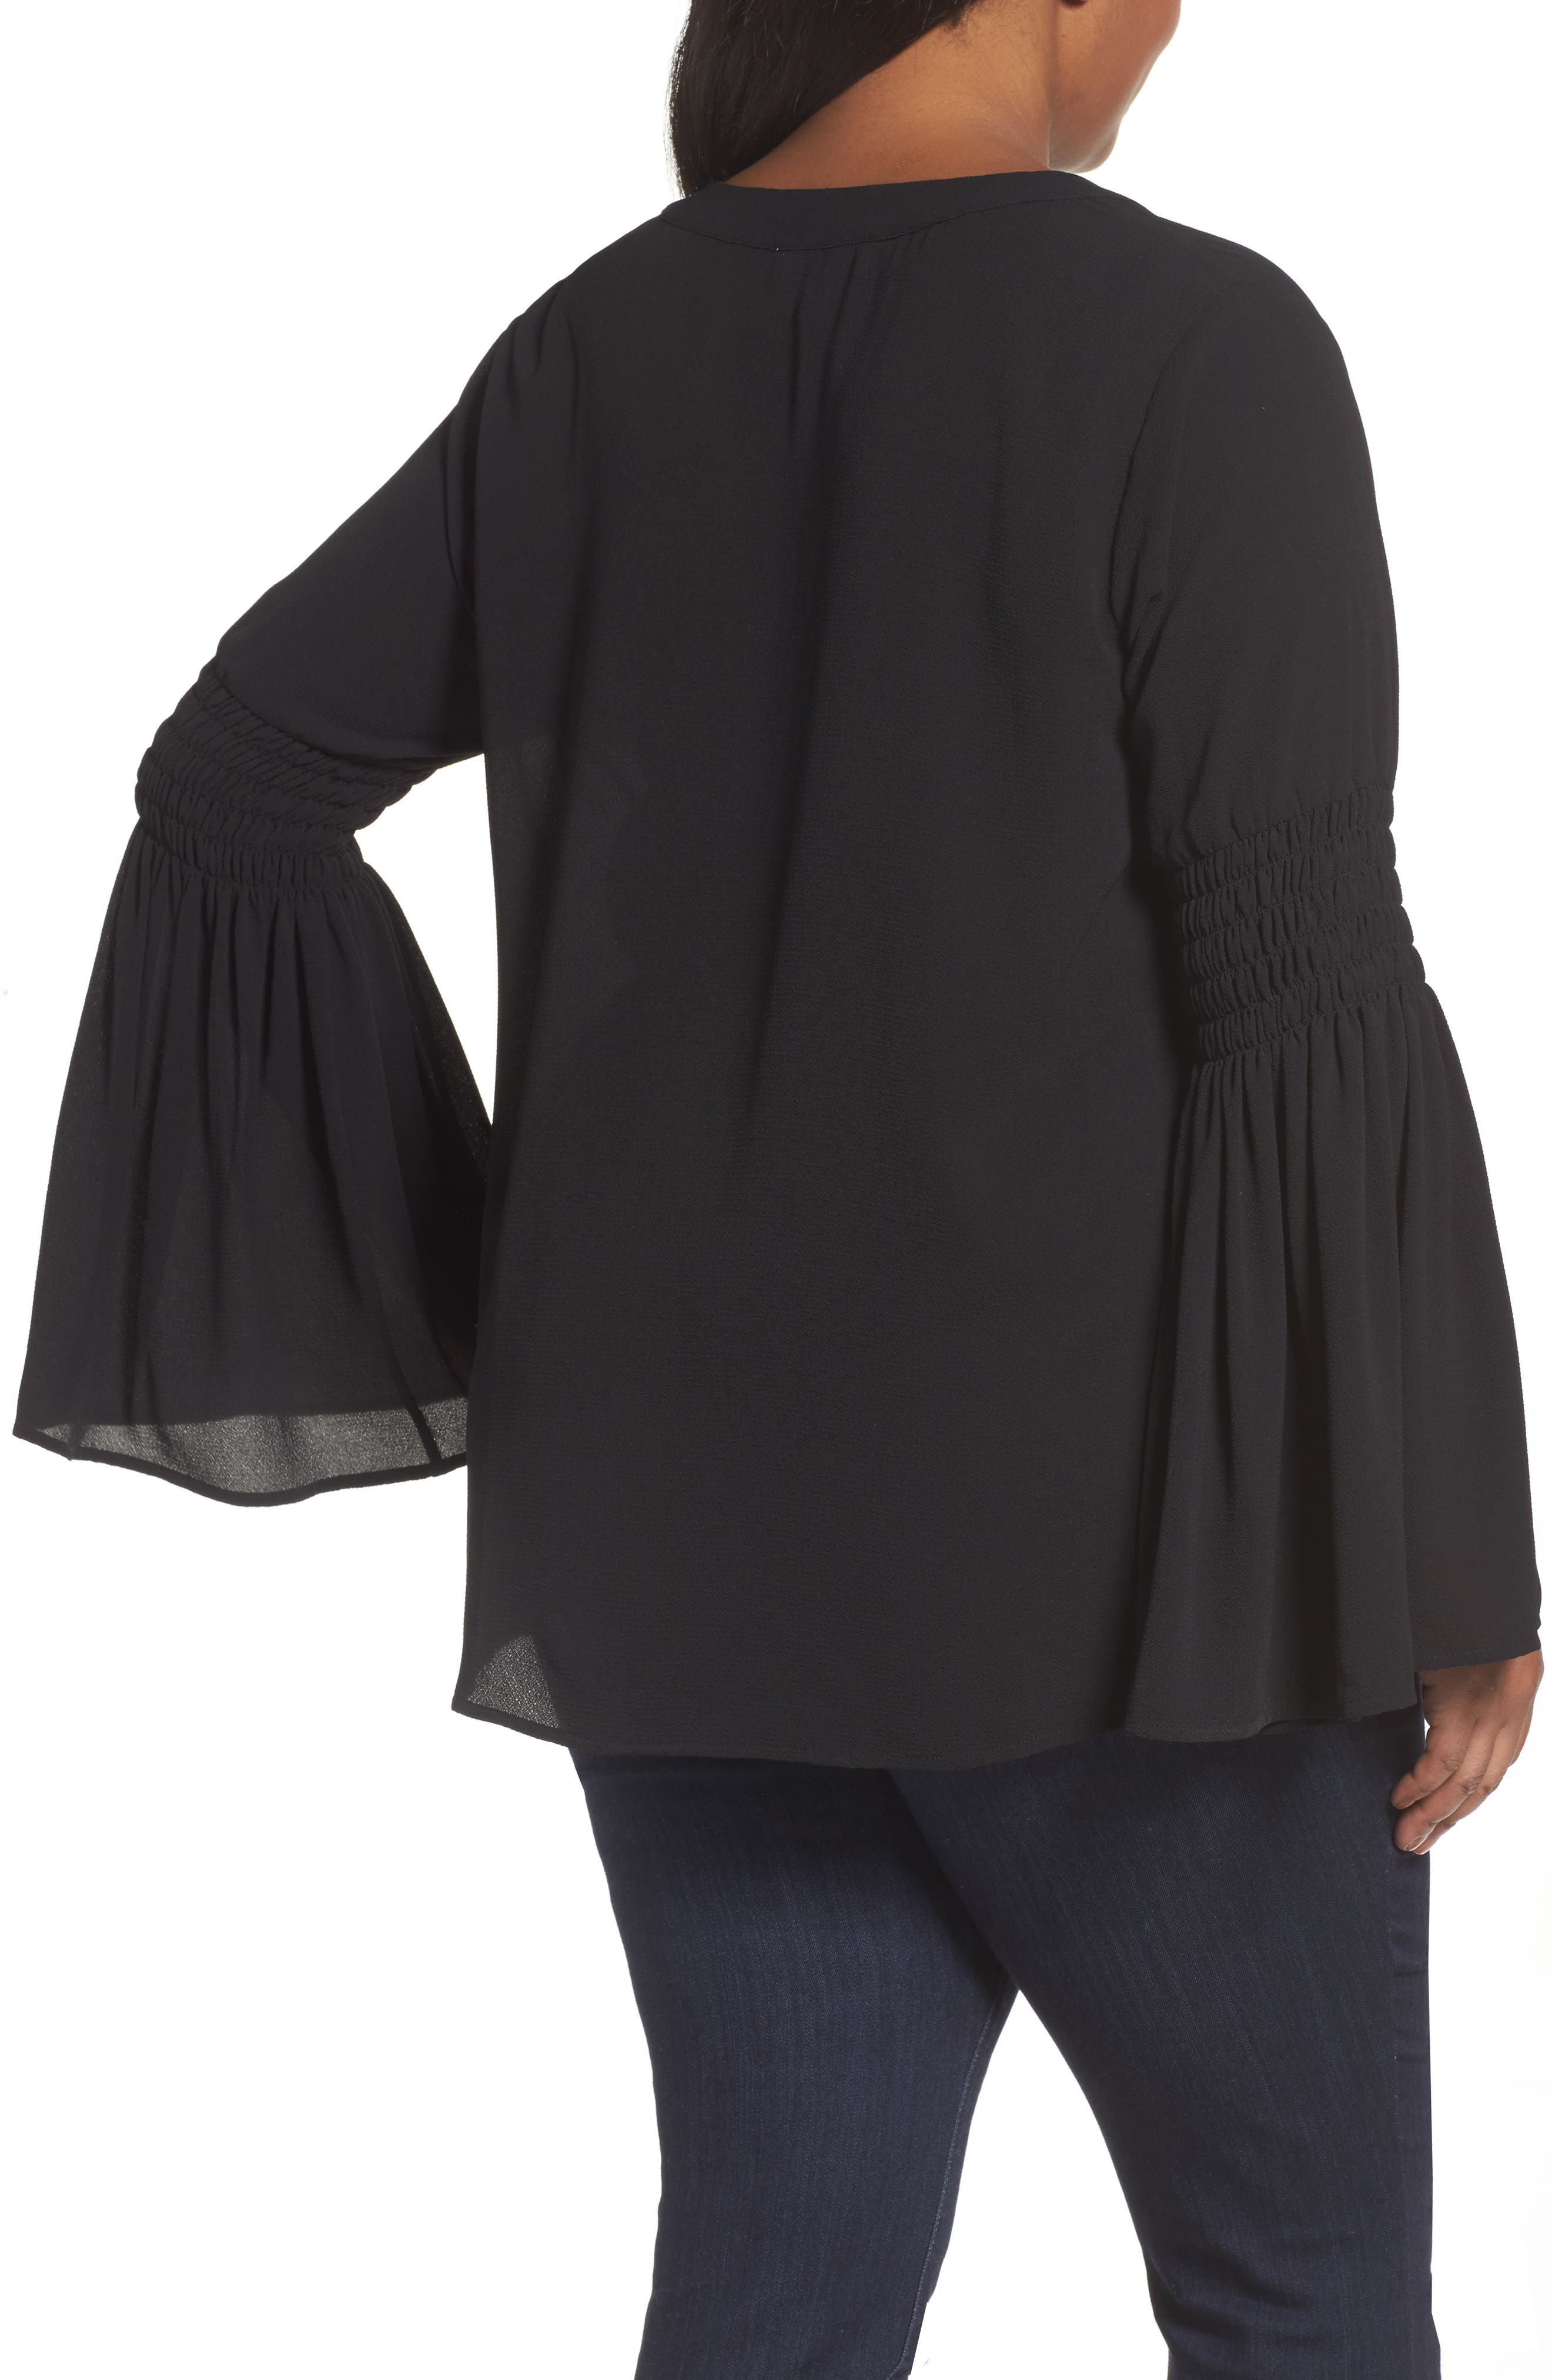 Bell Sleeve Tunic,                             Alternate thumbnail 2, color,                             Black